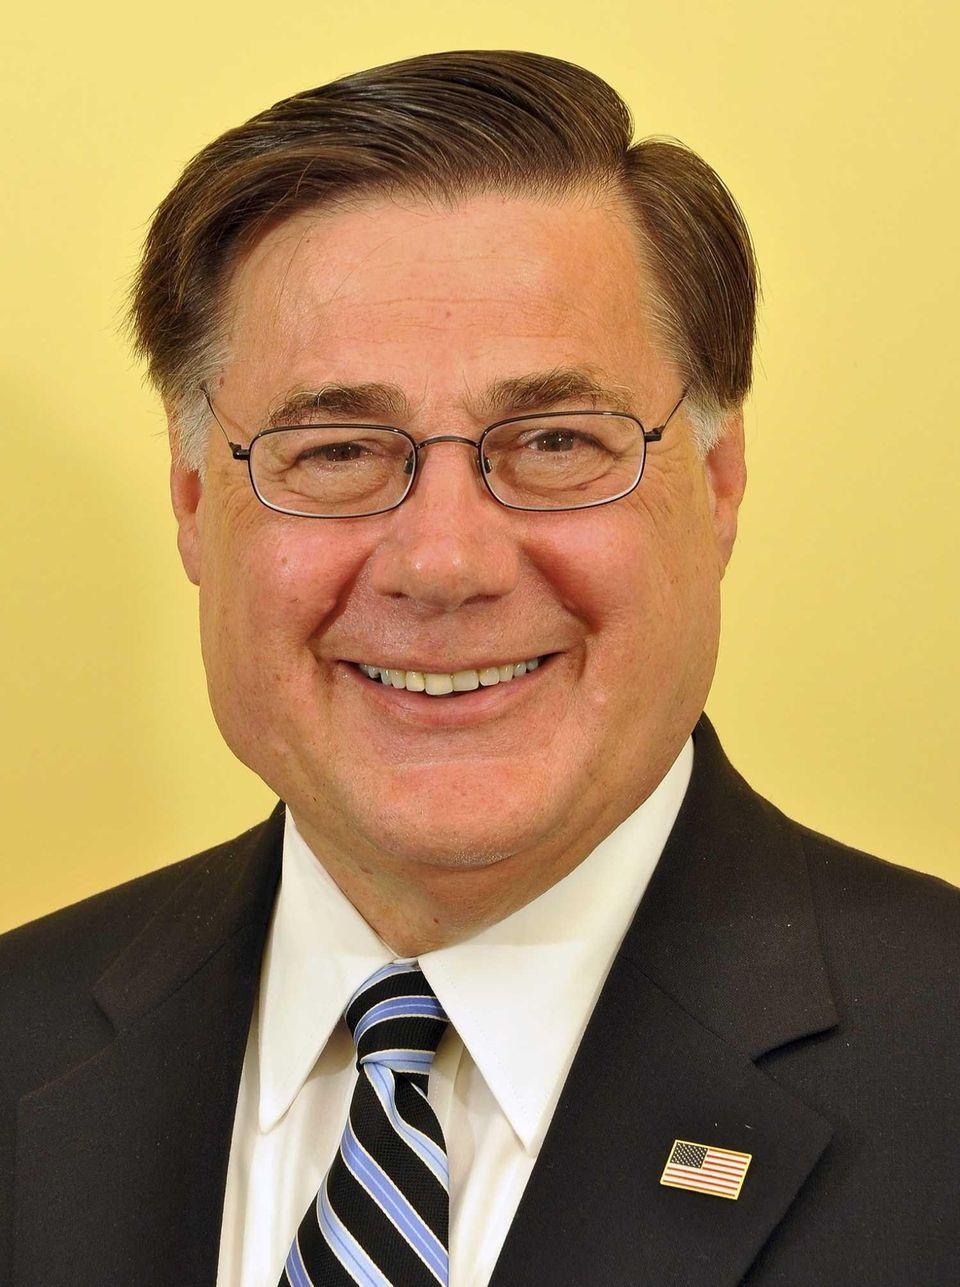 Brookhaven Town Supervisor Edward P. Romaine